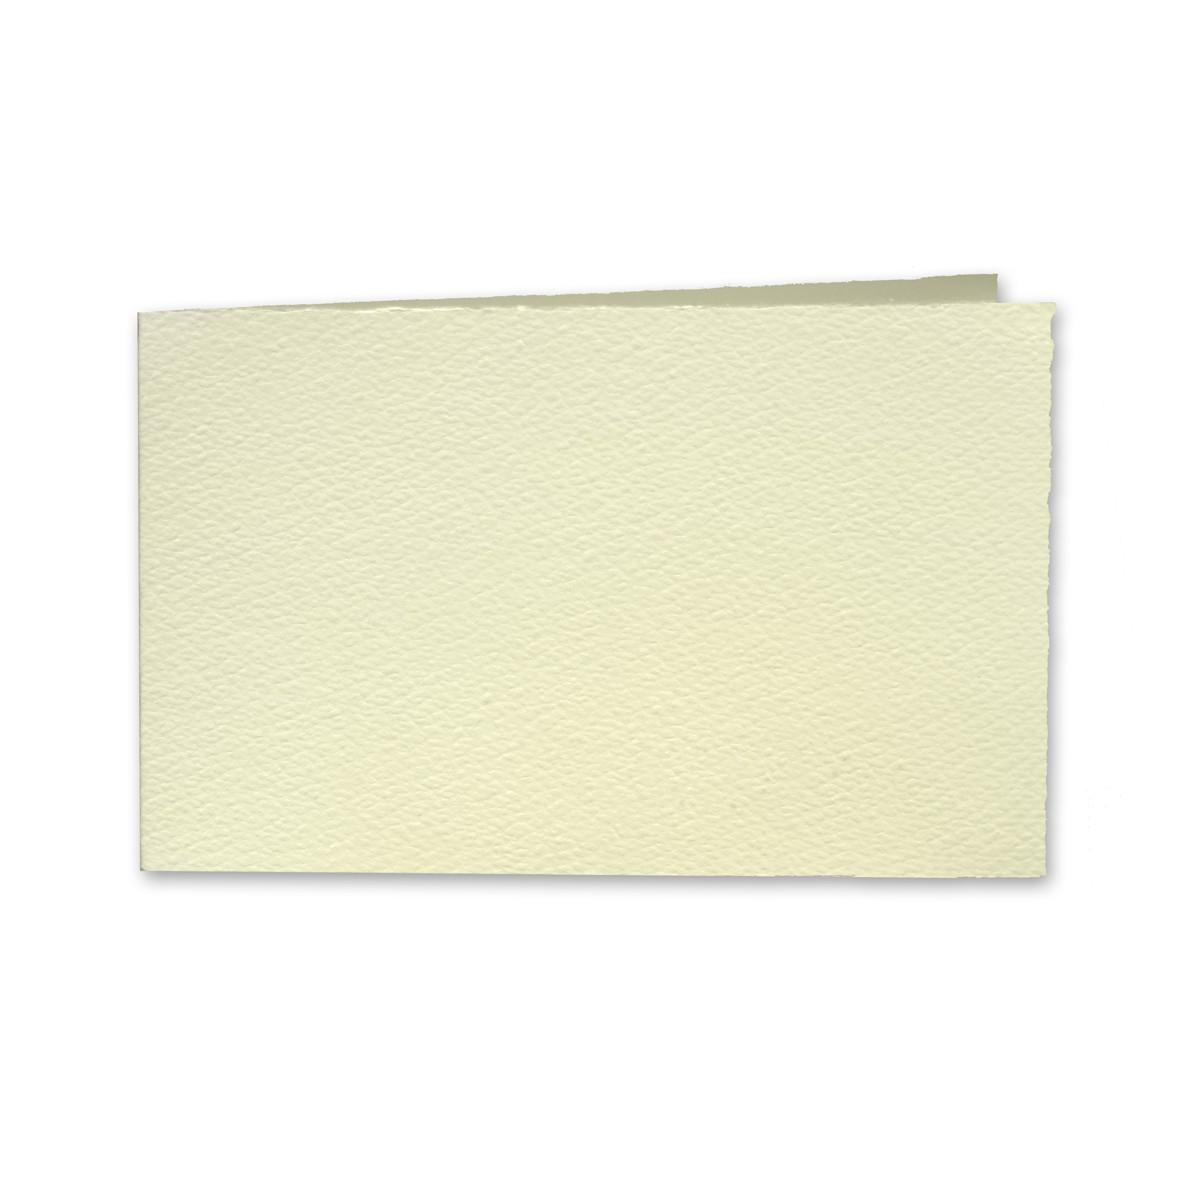 "Arturo Celadon Album Foldovers (600AC) 97# Cover (4.53"" x 13.39"" open size) Bulk Pack of 100"